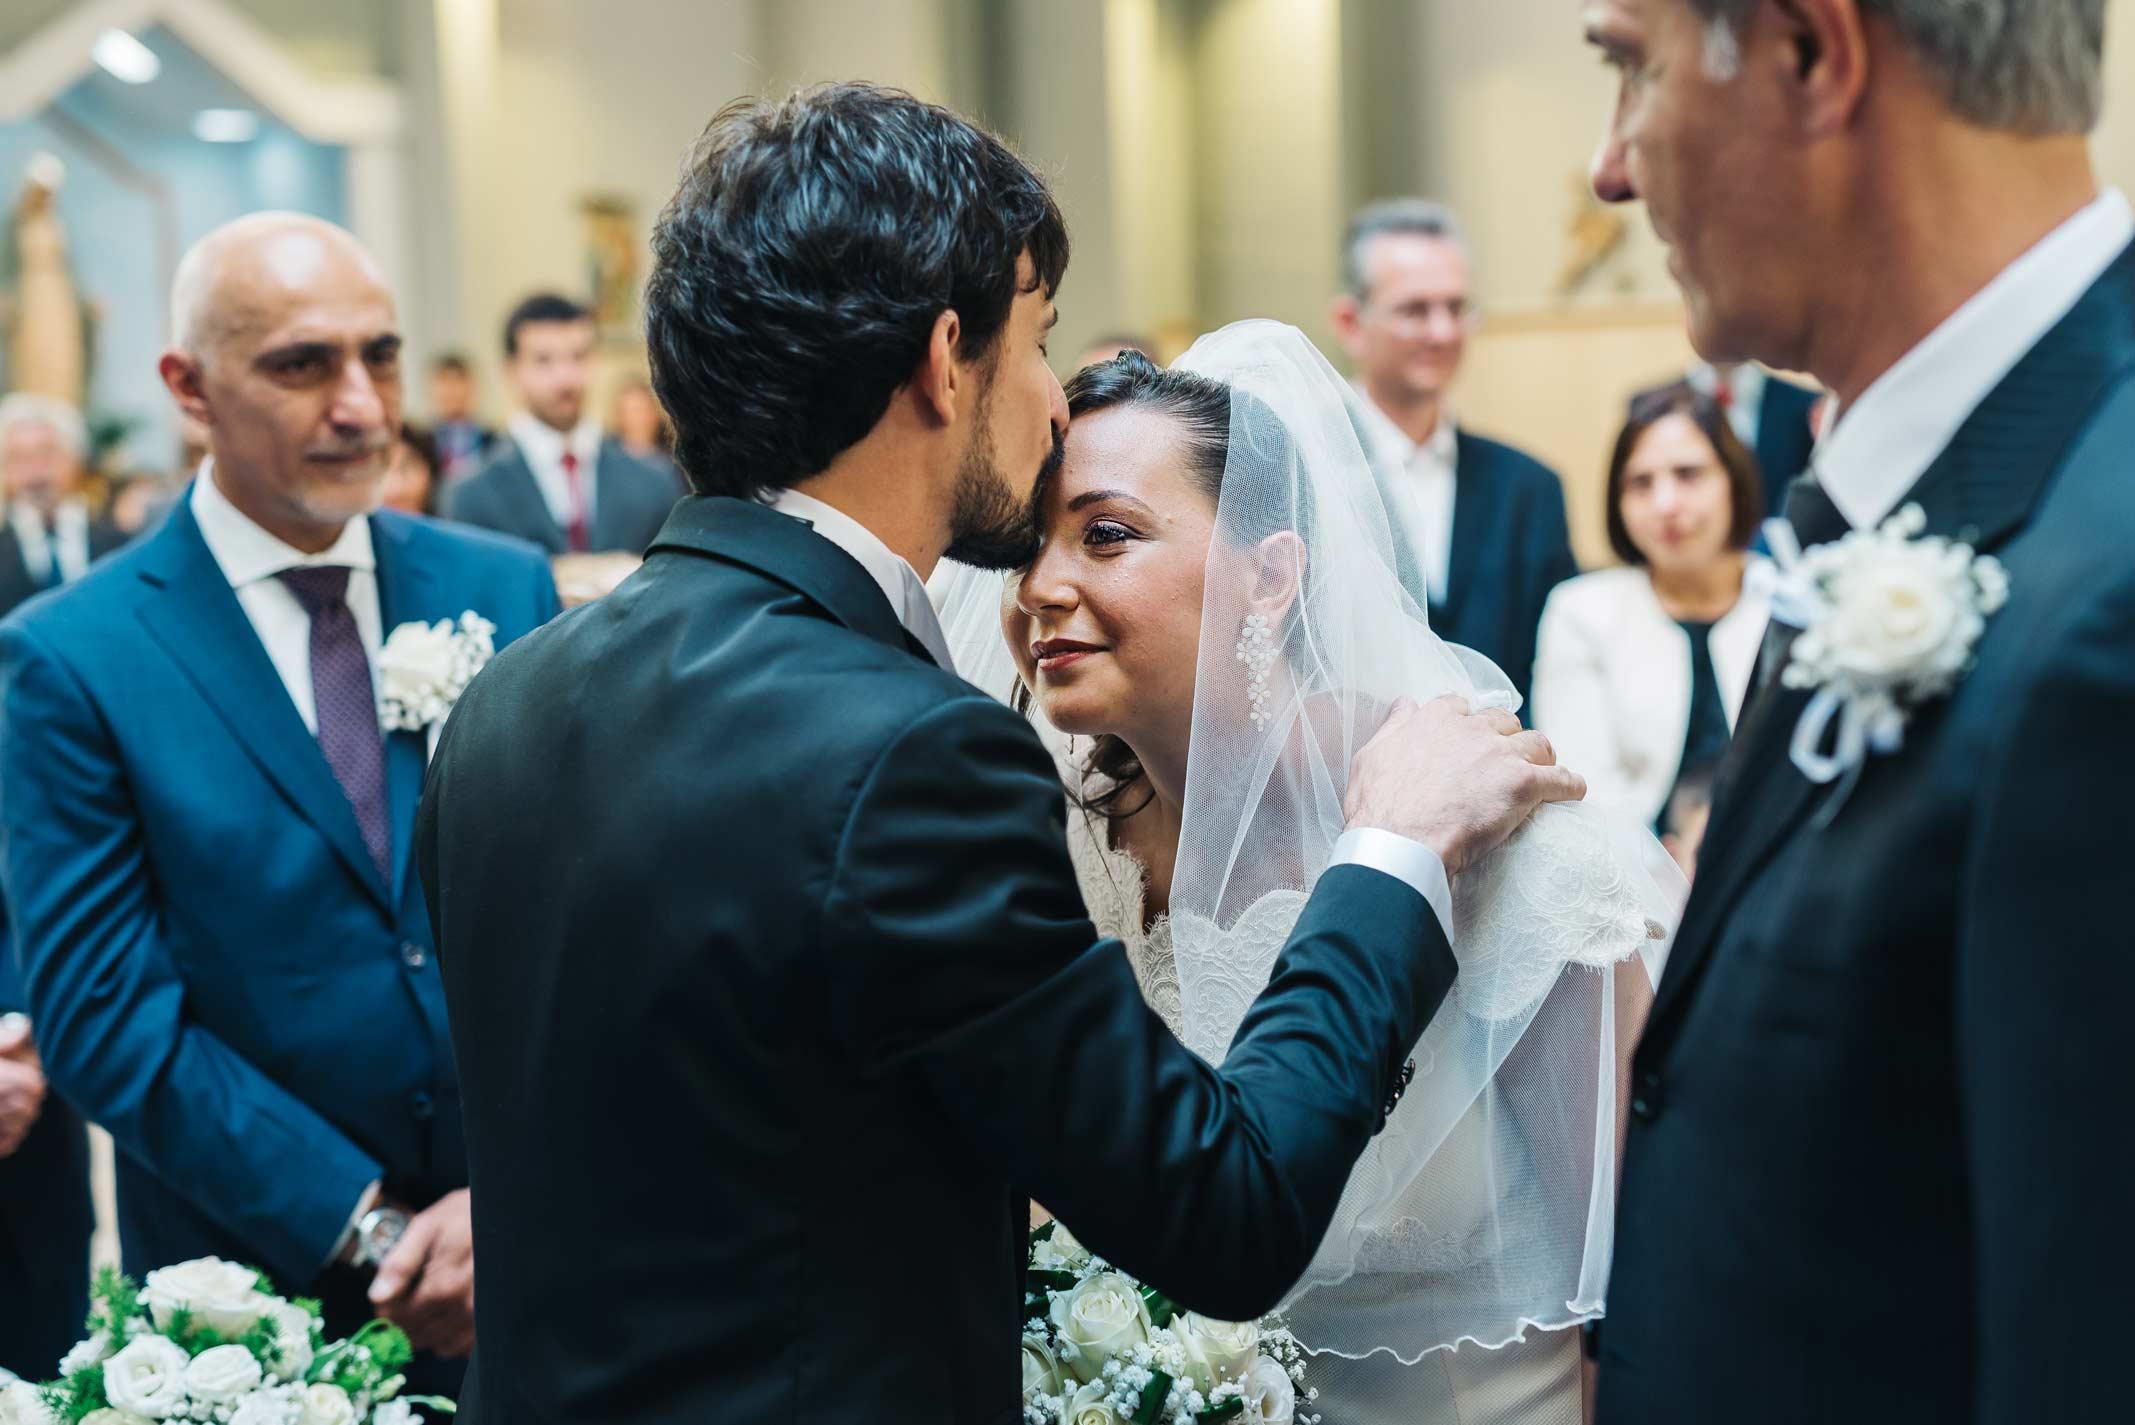 Matrimonio-Fotografo-Reportage-Cerimonia